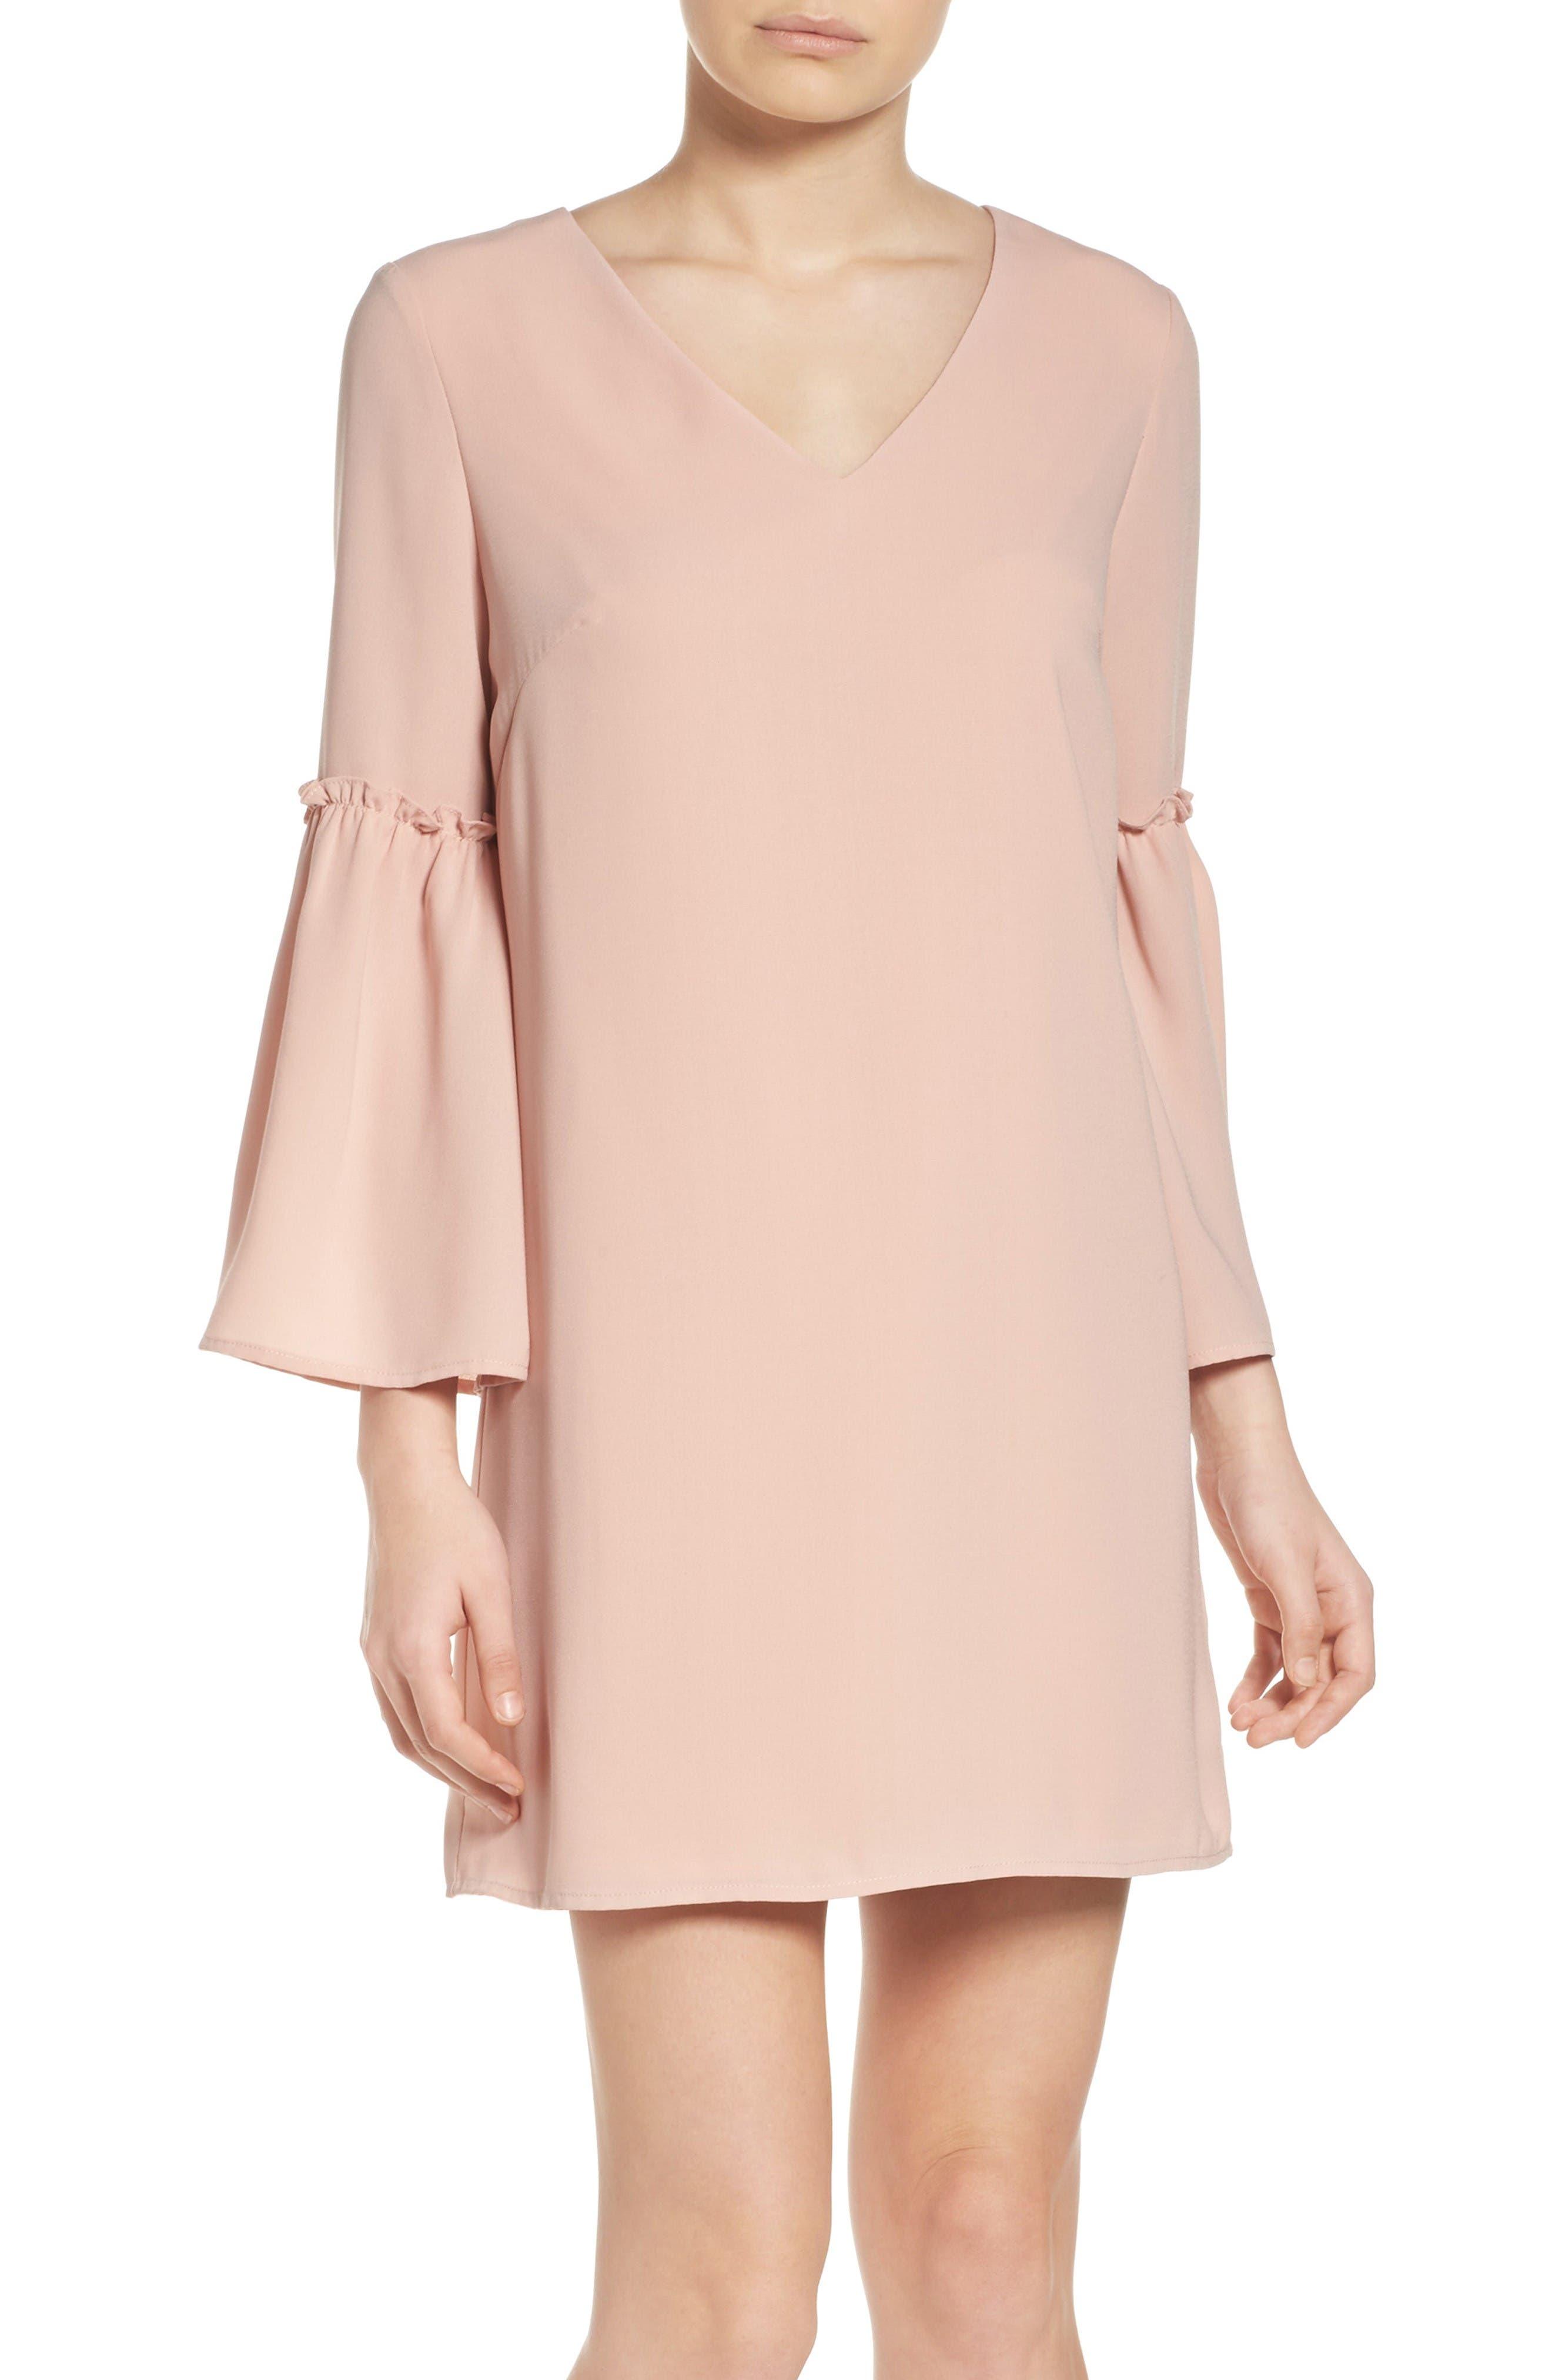 Main Image - Chelsea28 Ruffle Bell Sleeve Dress